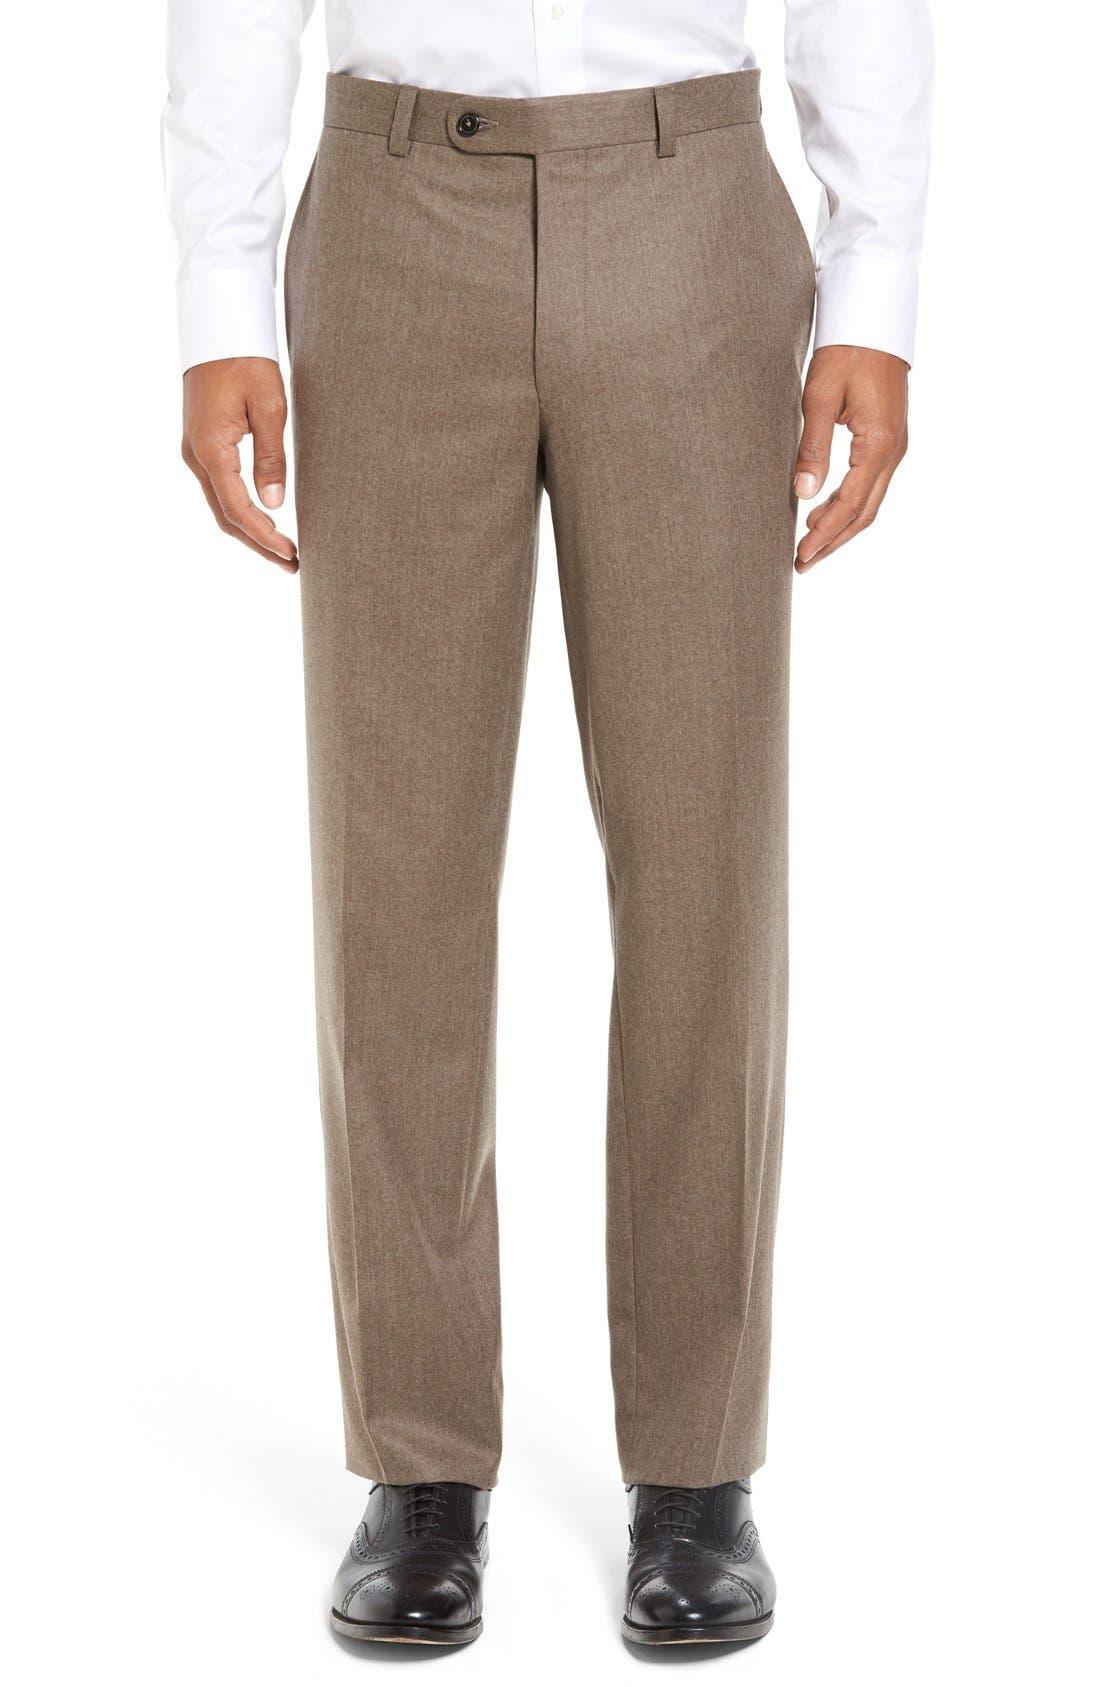 'Ryan' Classic Fit Trousers,                             Main thumbnail 1, color,                             Tan